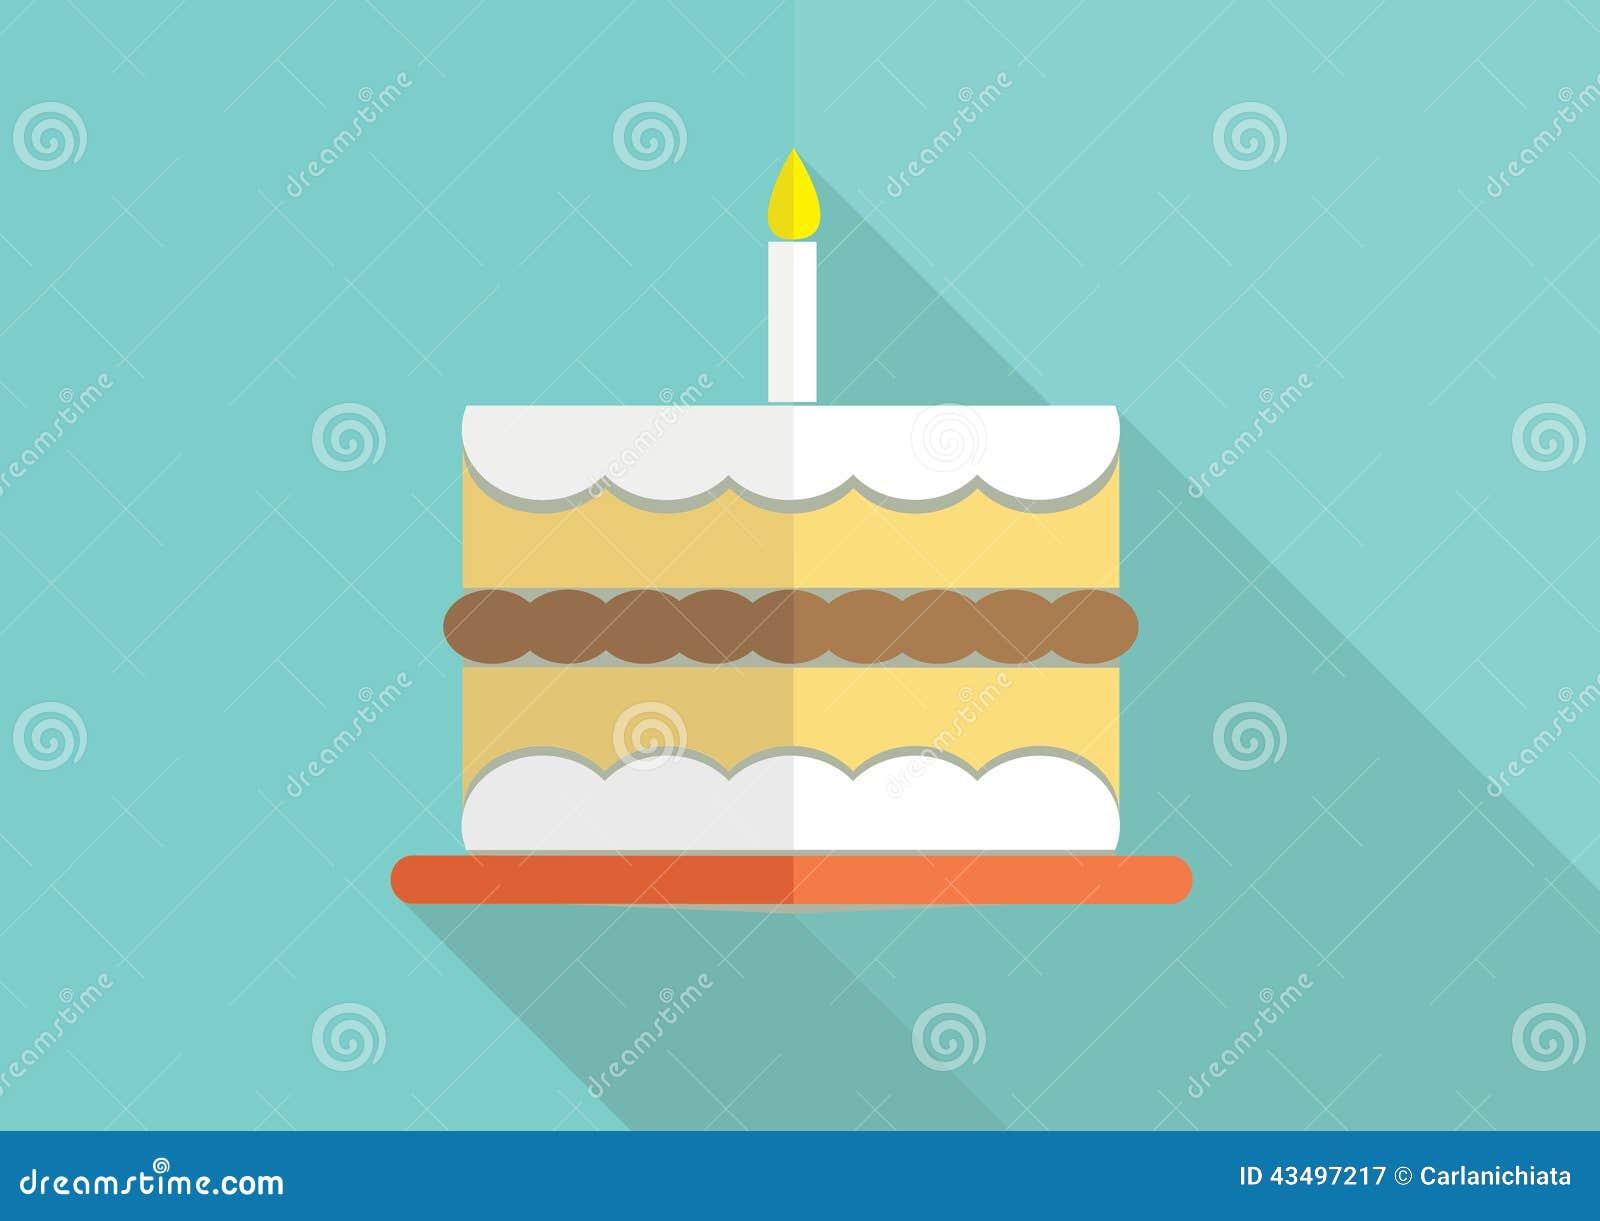 Birthday Cake Stock Vector Illustration Of Creative 43497217